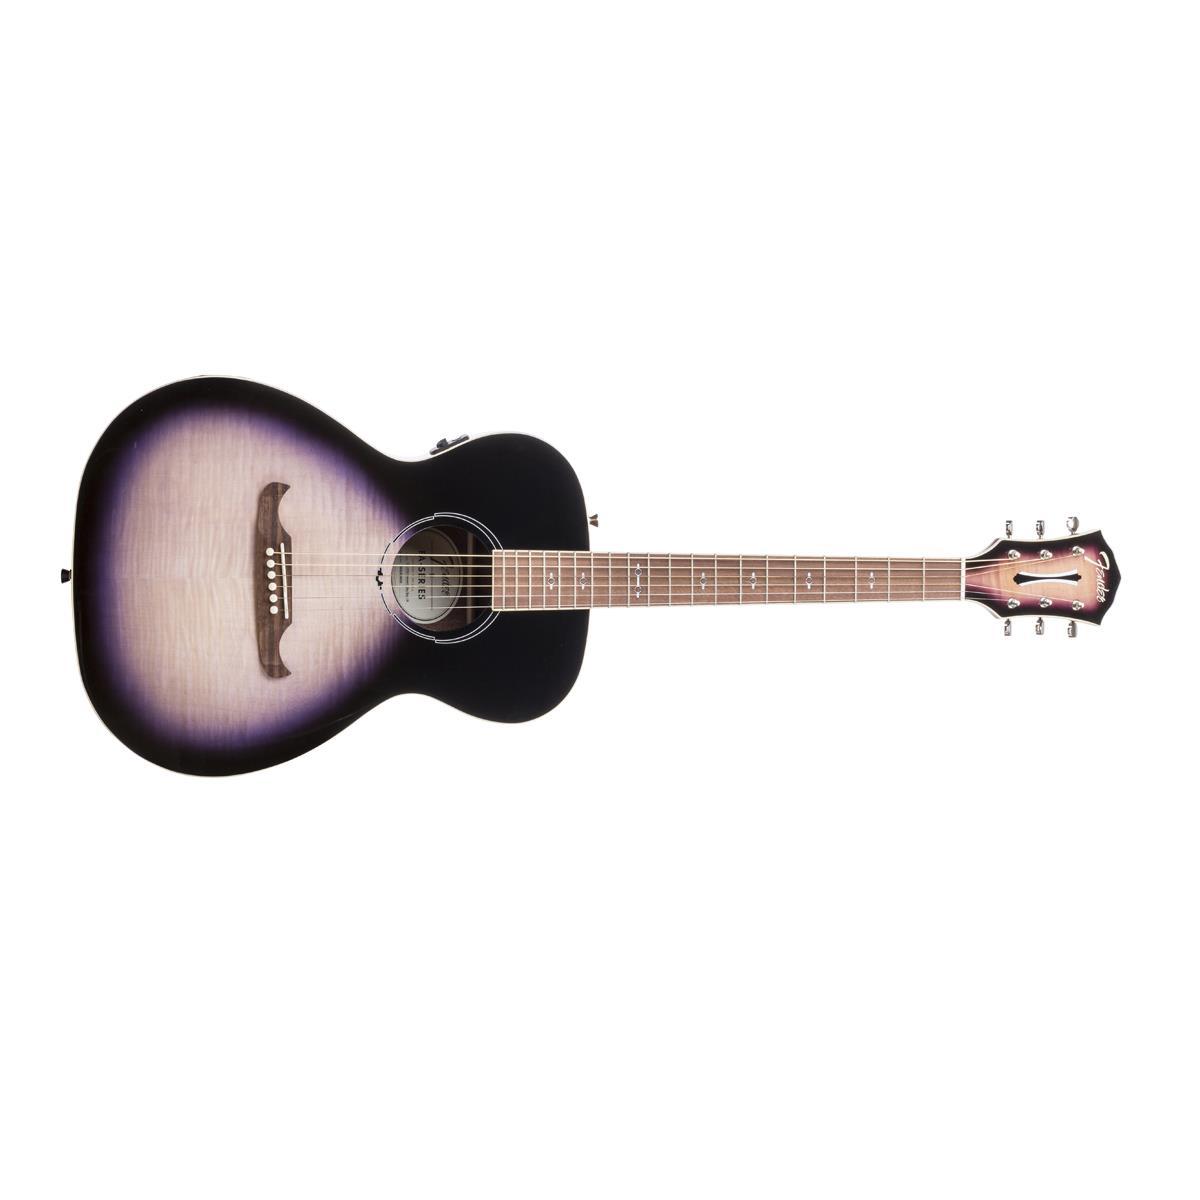 Fender FA-235E Concert Acoustic Electric Guitar $169.99 at Adorama +Free Shipping